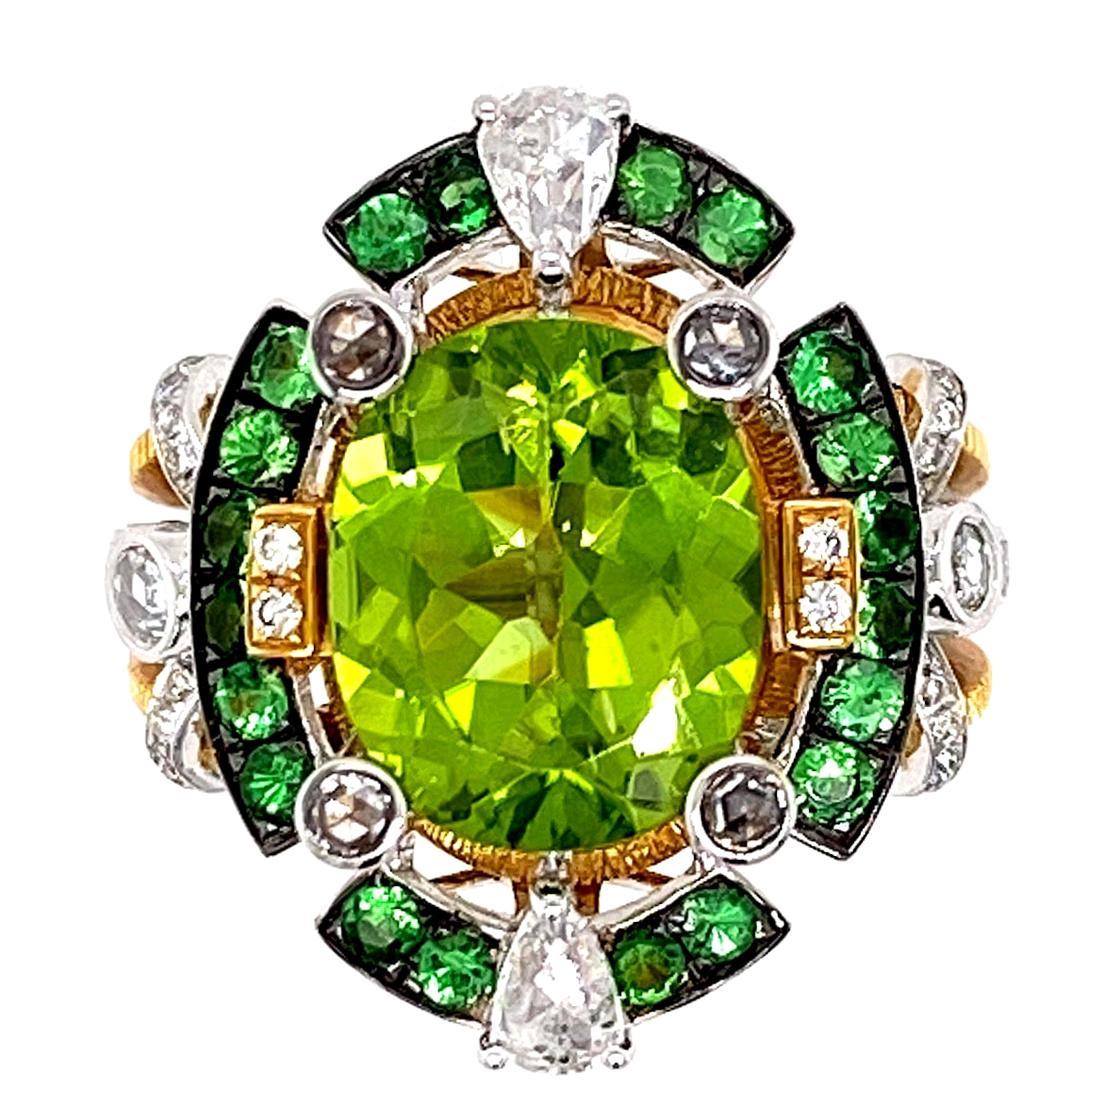 IGI Certified Peridot and Diamond Engagement Statement Ring in 18 Karat Gold